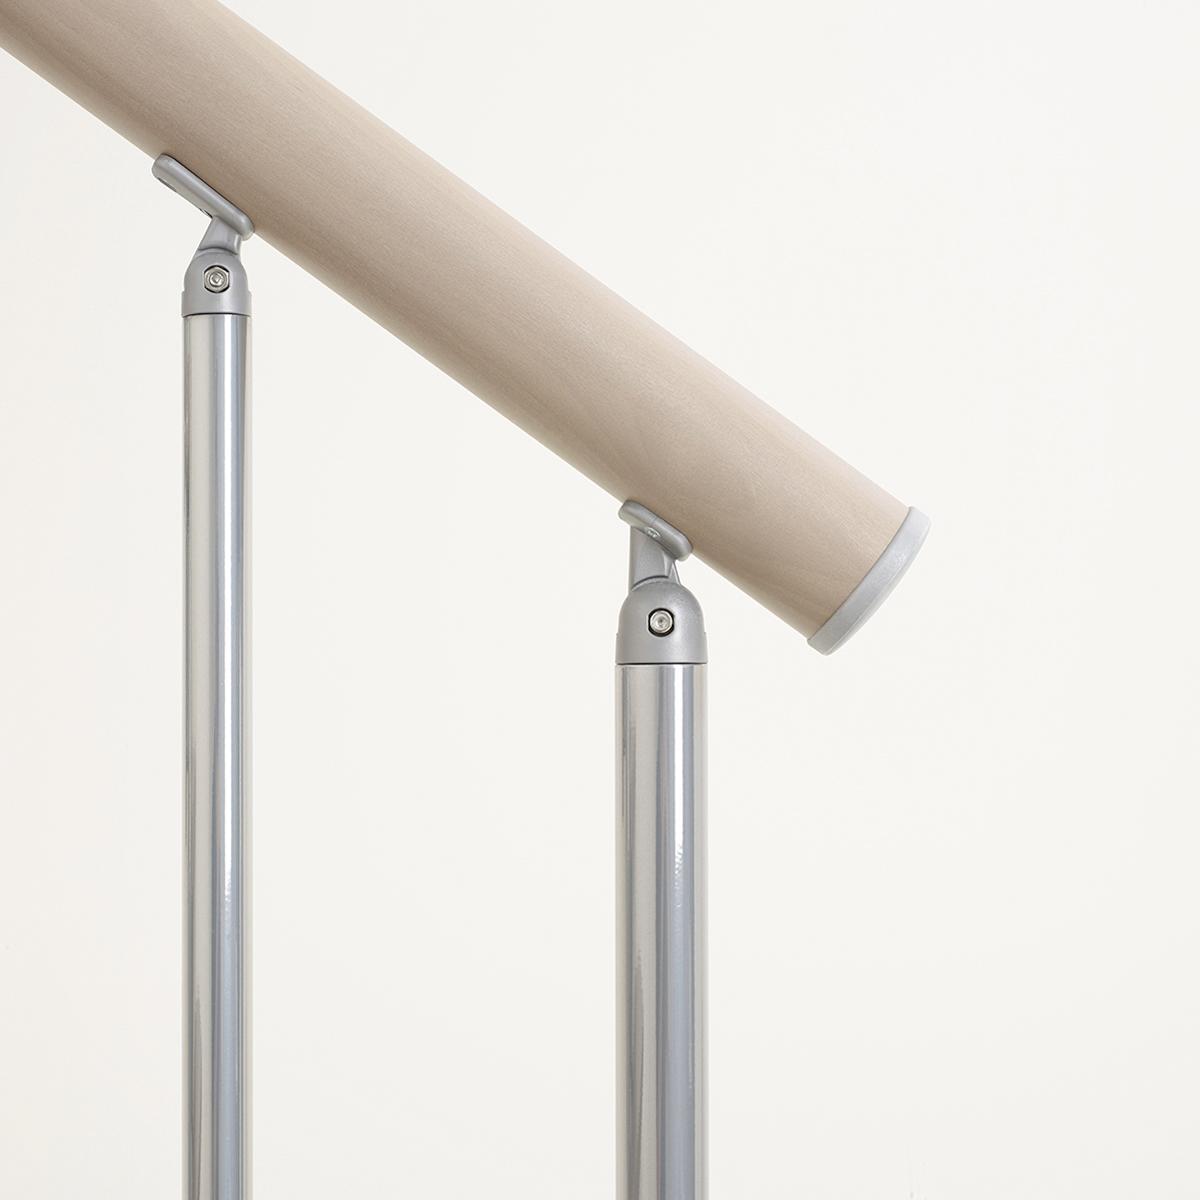 Scala a rampa 1/4 di giro Long FONTANOT L 75 cm, gradino tortora, struttura cromato - 5